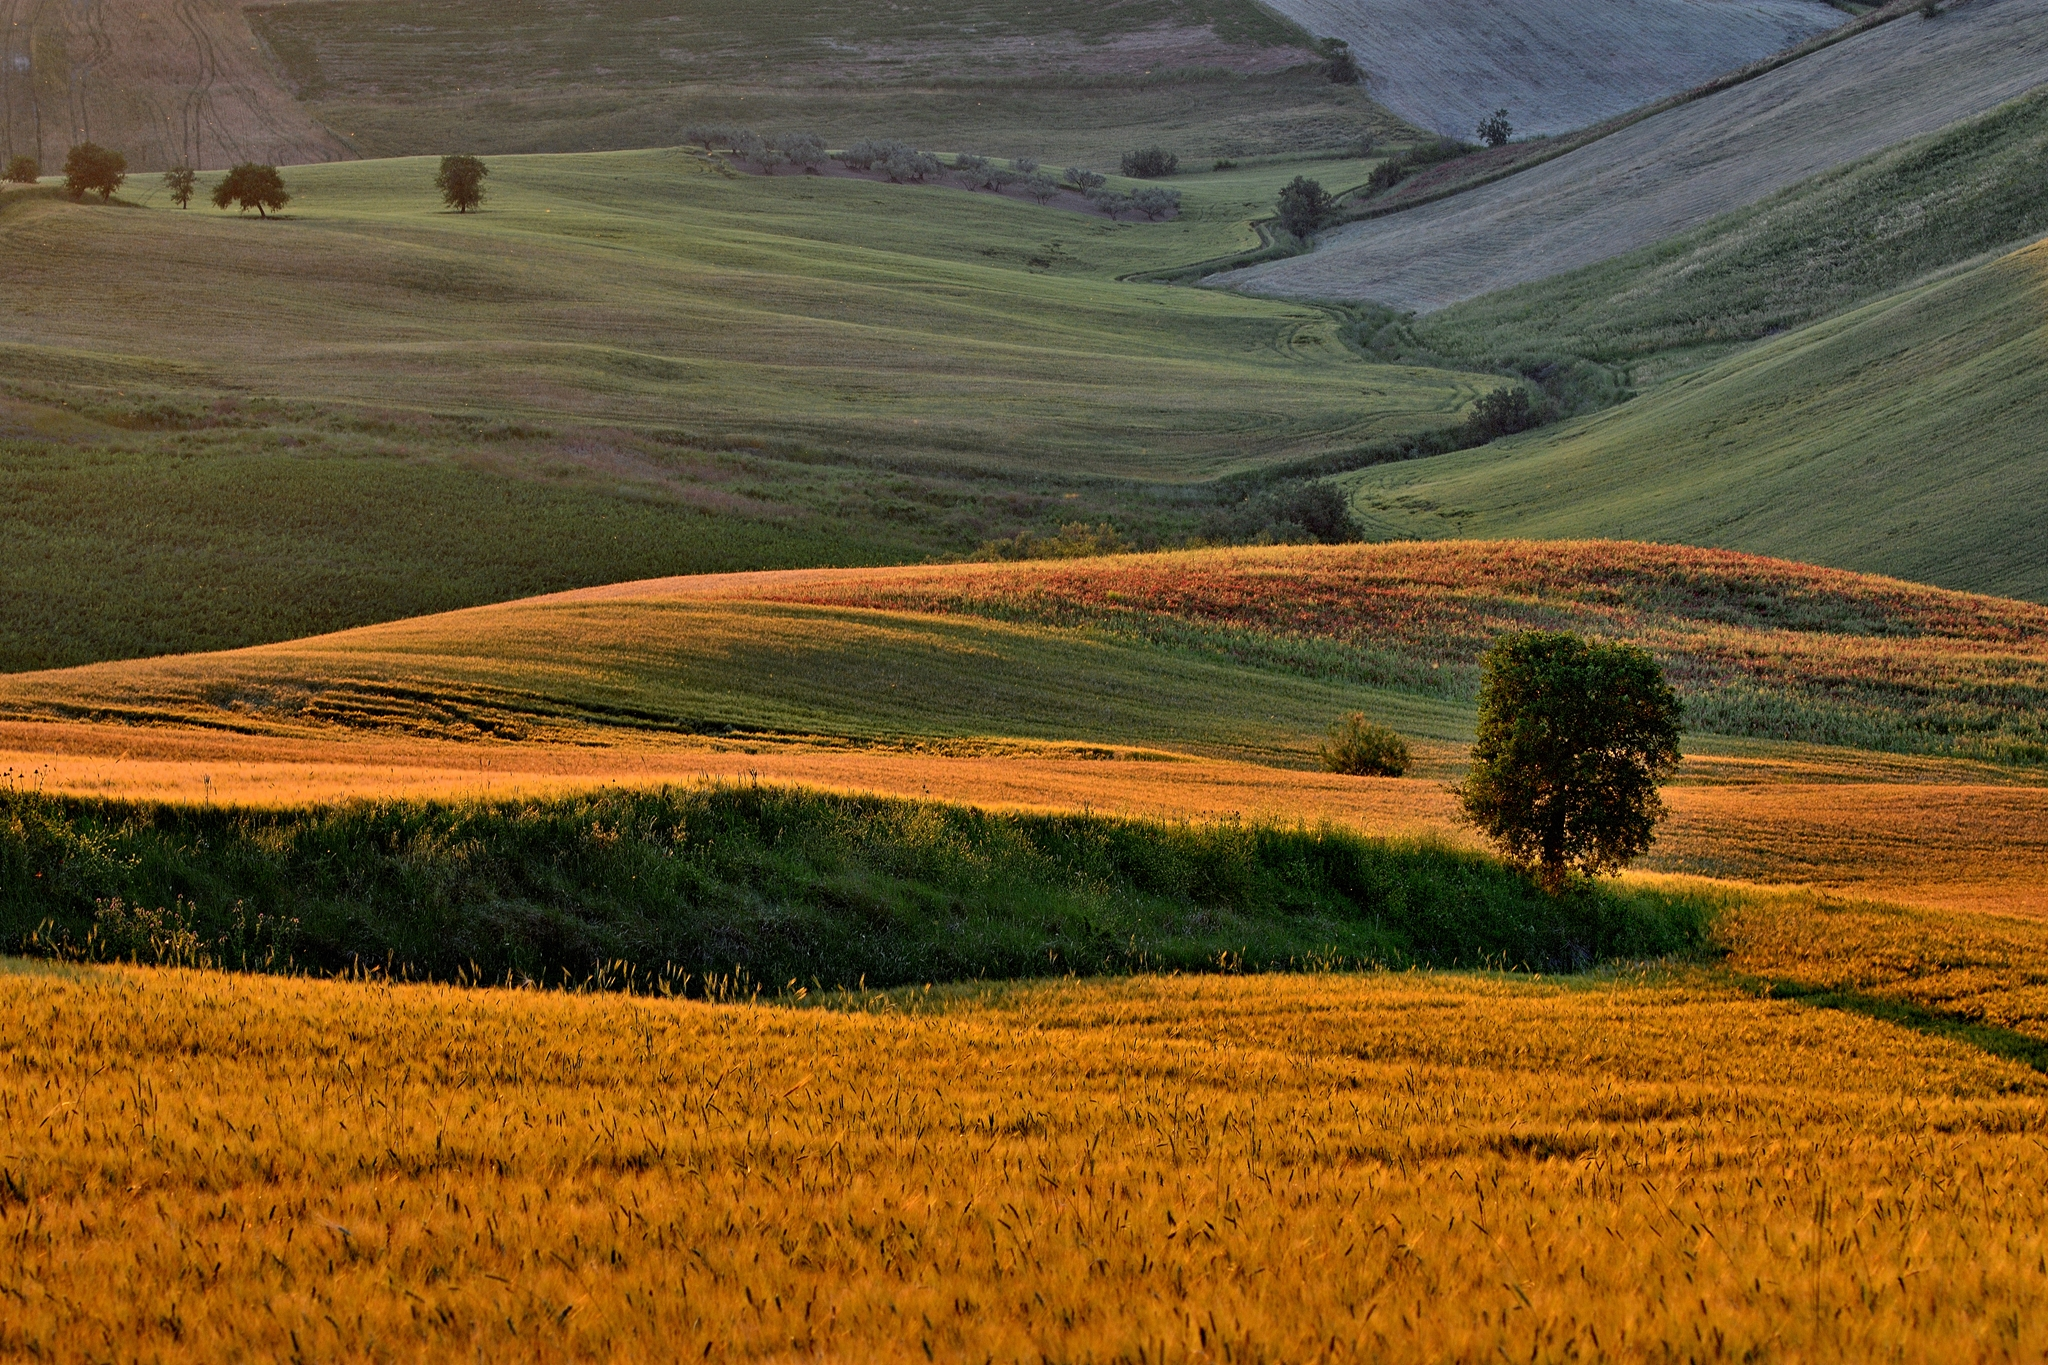 Wheat and surroundings...